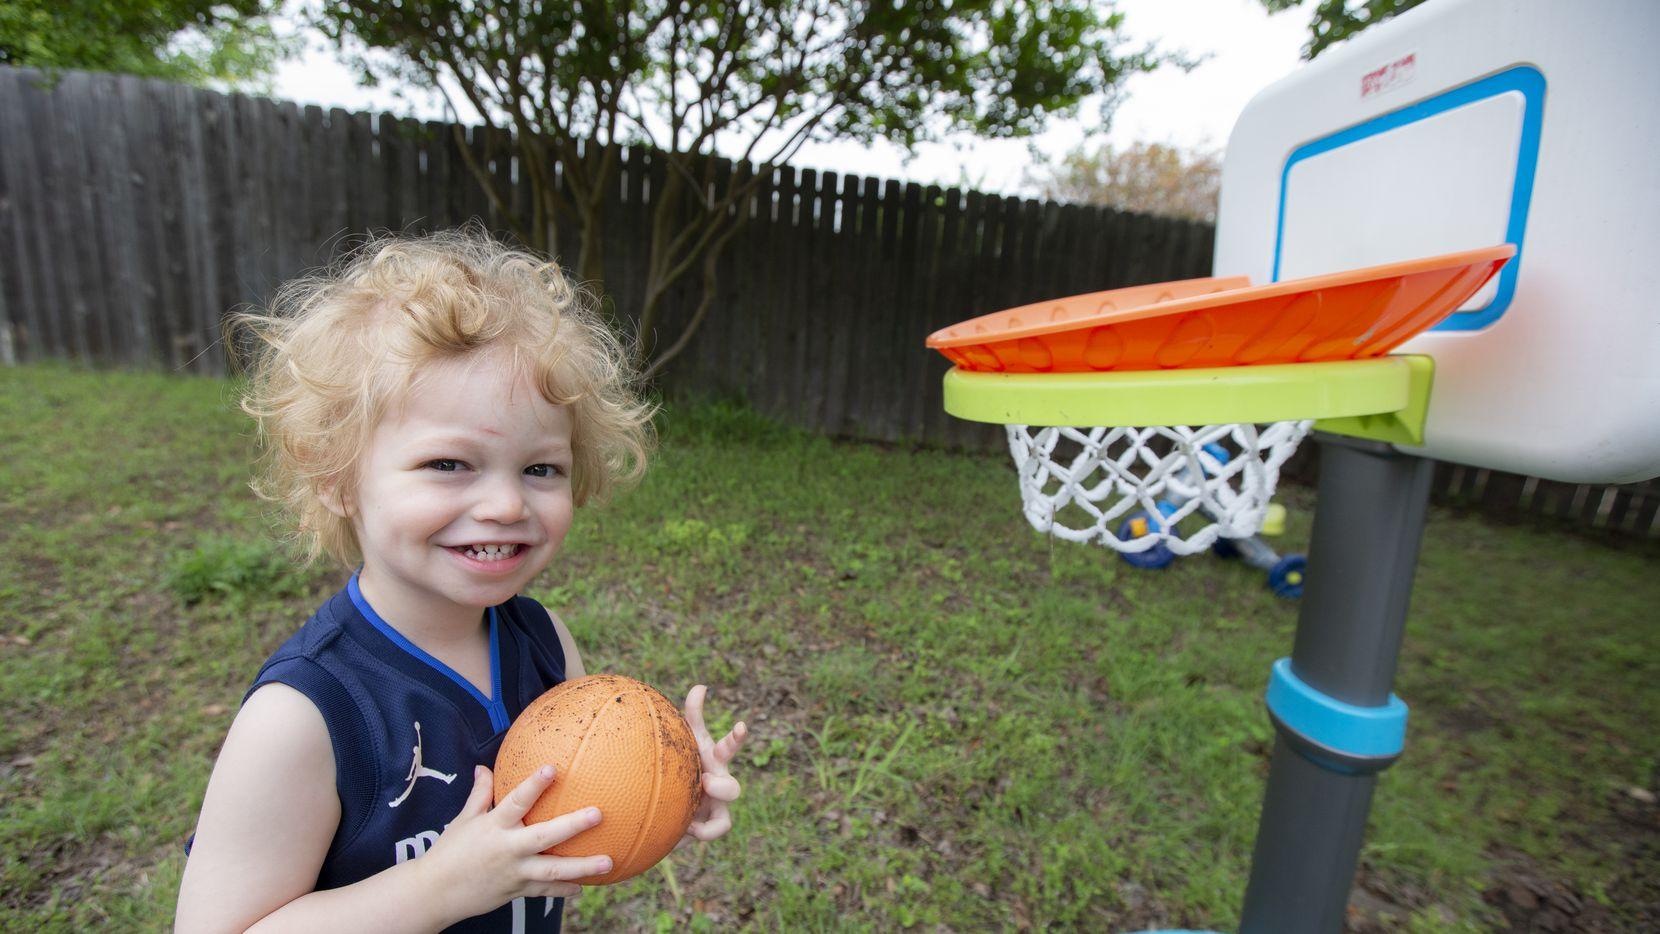 Luka Miller, 2, named after Dallas Mavericks' guard Luka Doncic, plays basketball in his backyard at his home in Glenn Heights, Thursday, May 13, 2021.(Brandon Wade/Special Contributor)